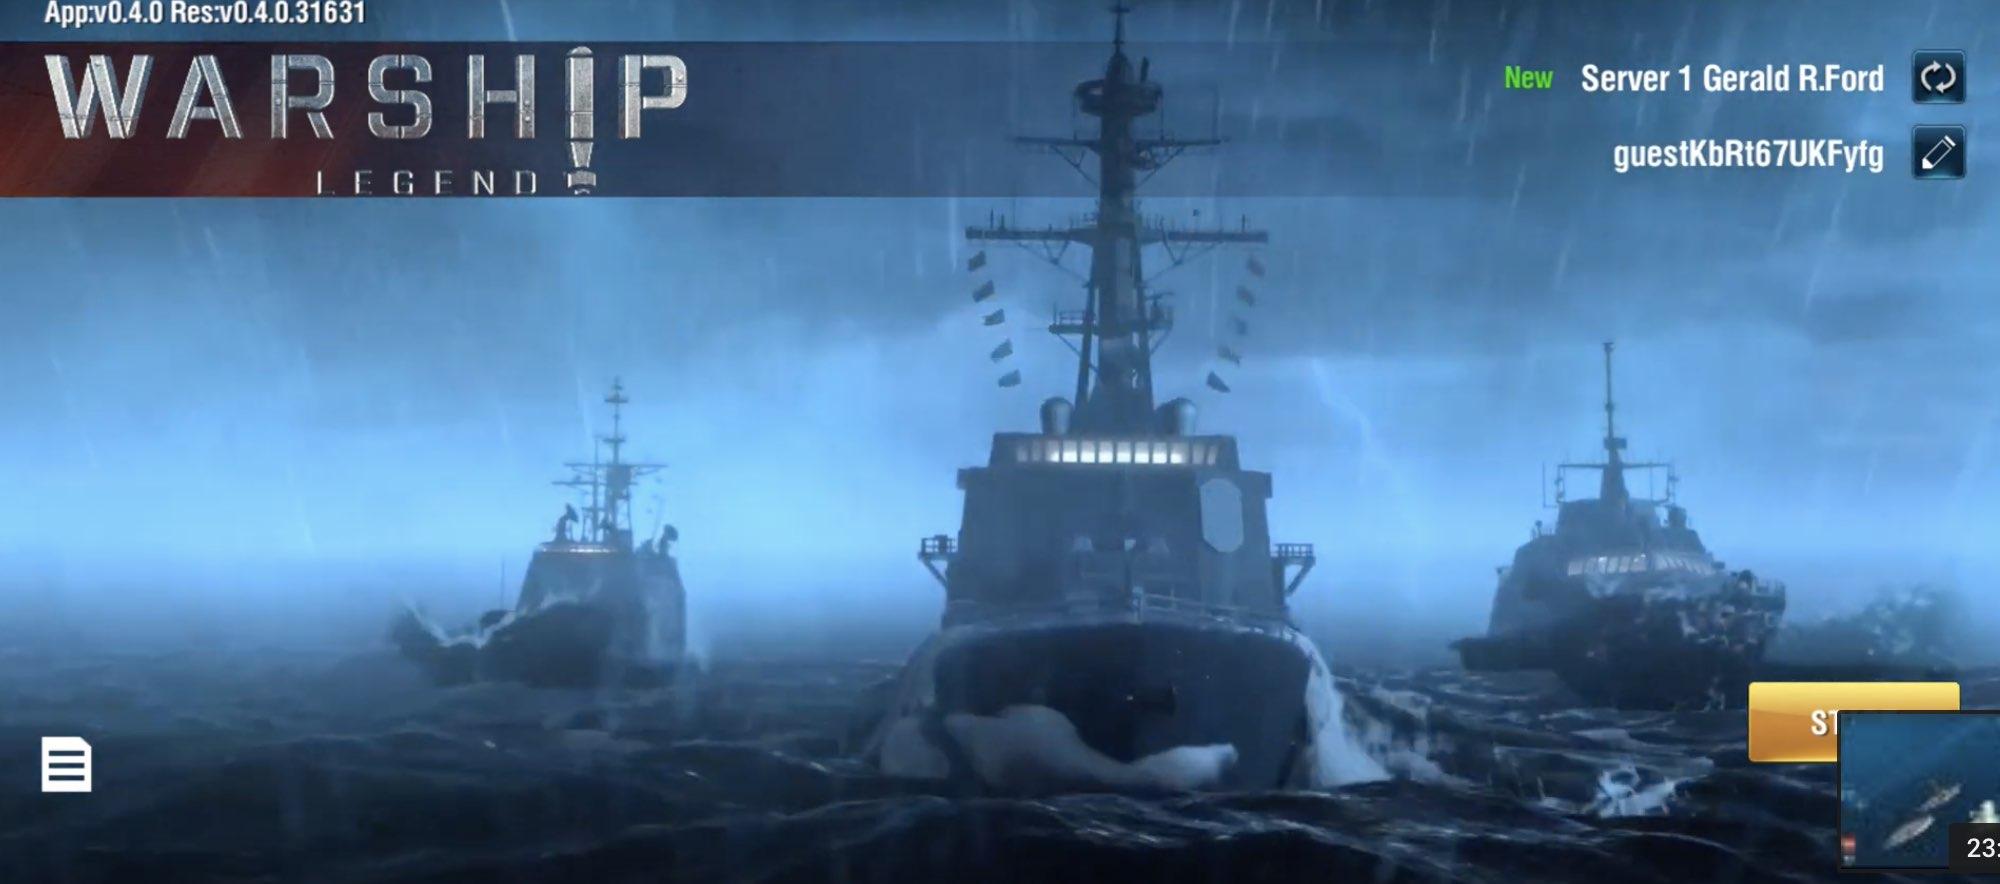 Warship Legend Idle hack